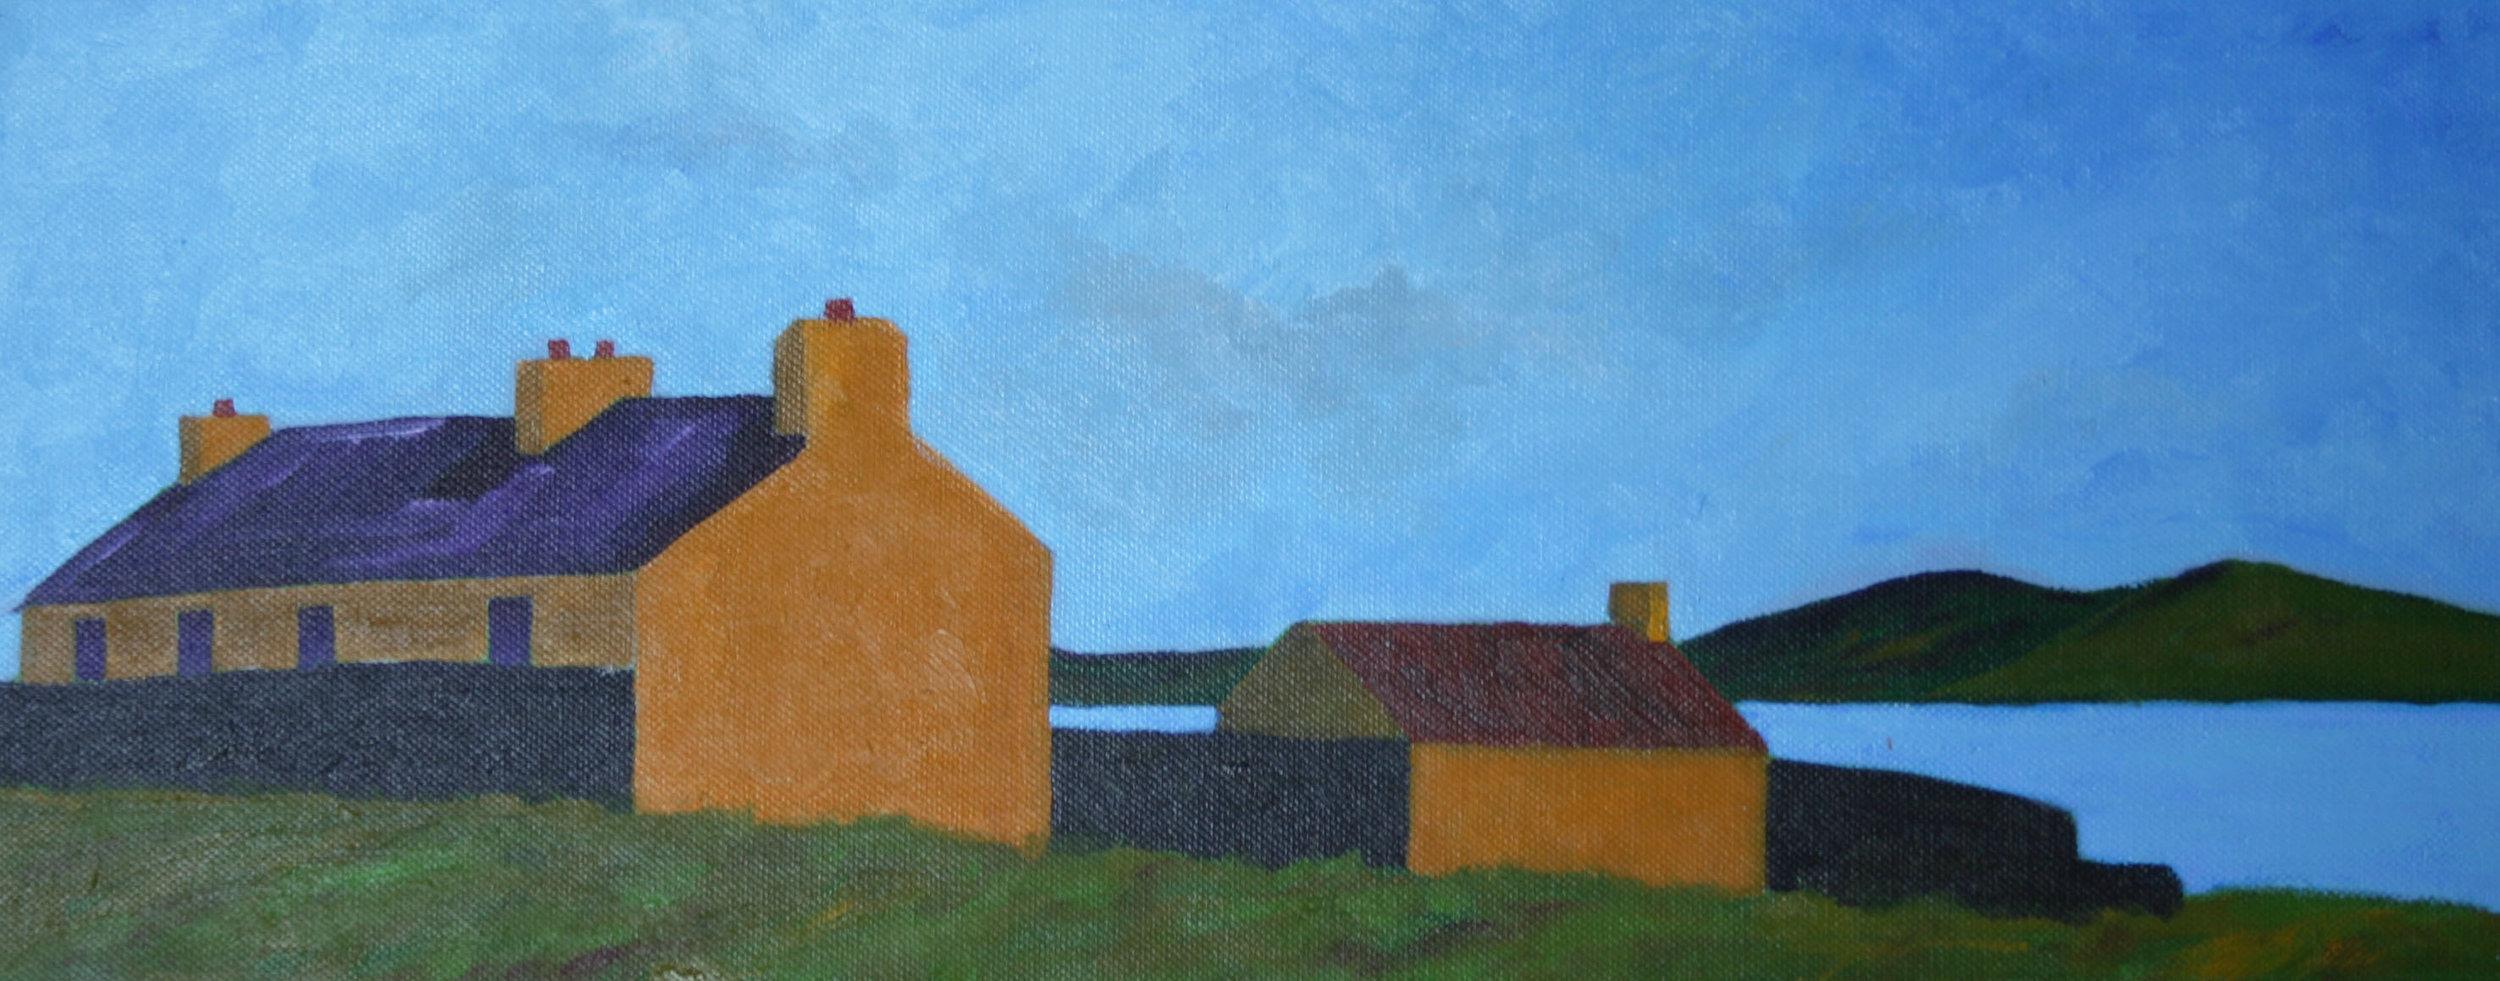 house-at-inch-8-2010.jpg